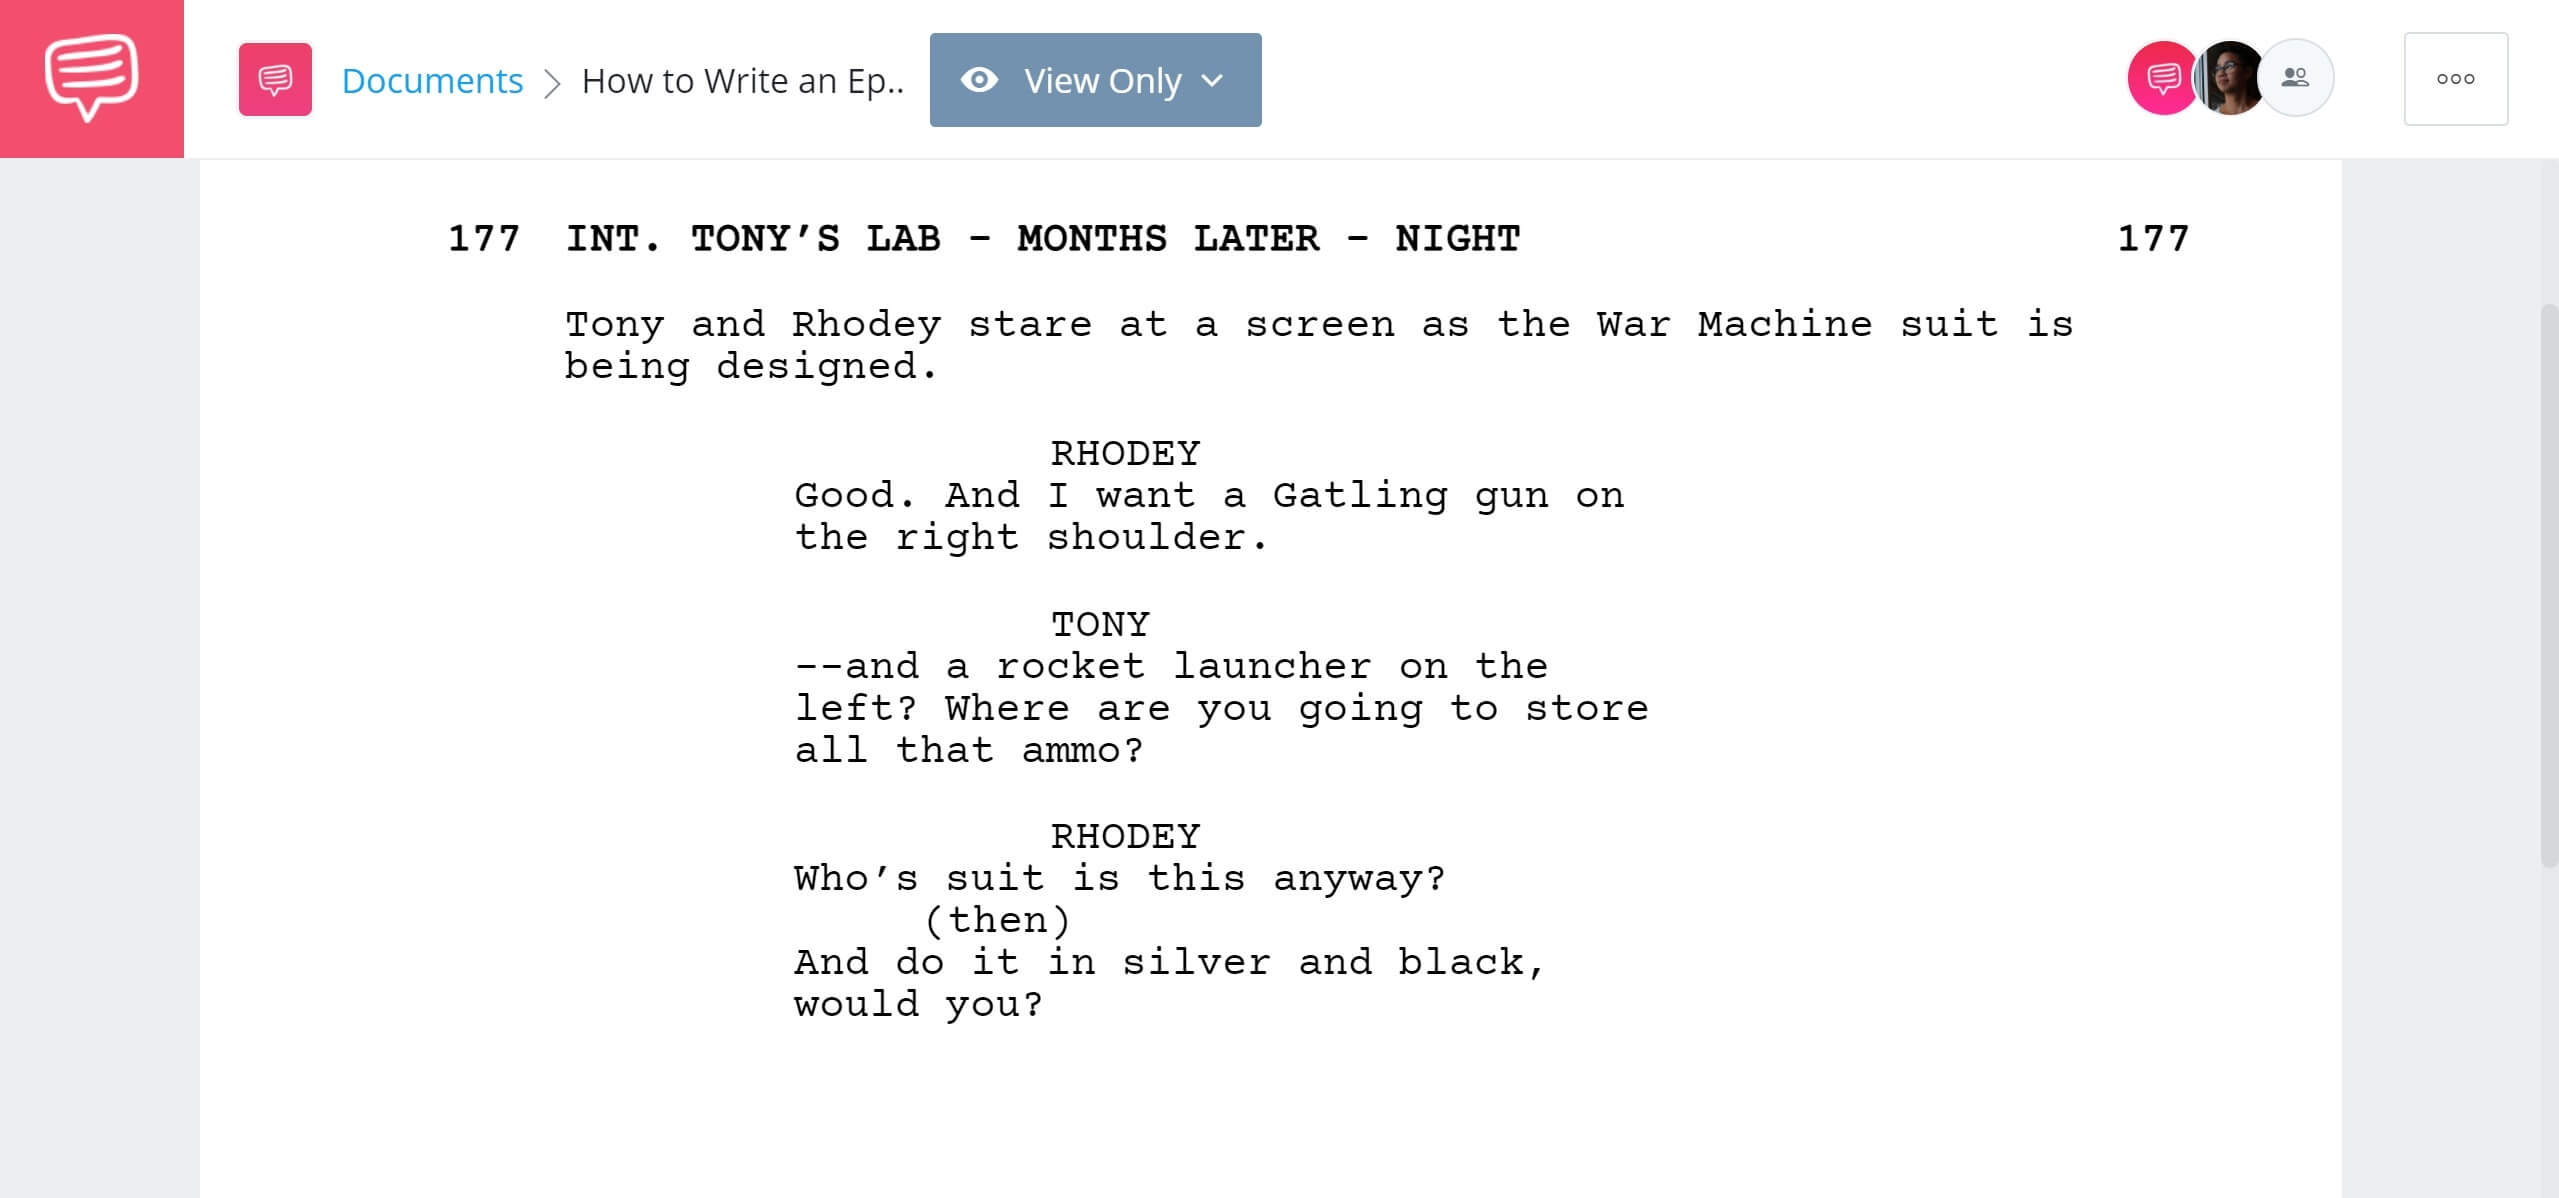 How to Write an Epilogue Iron Man Example StudioBinder Screenwriting Software